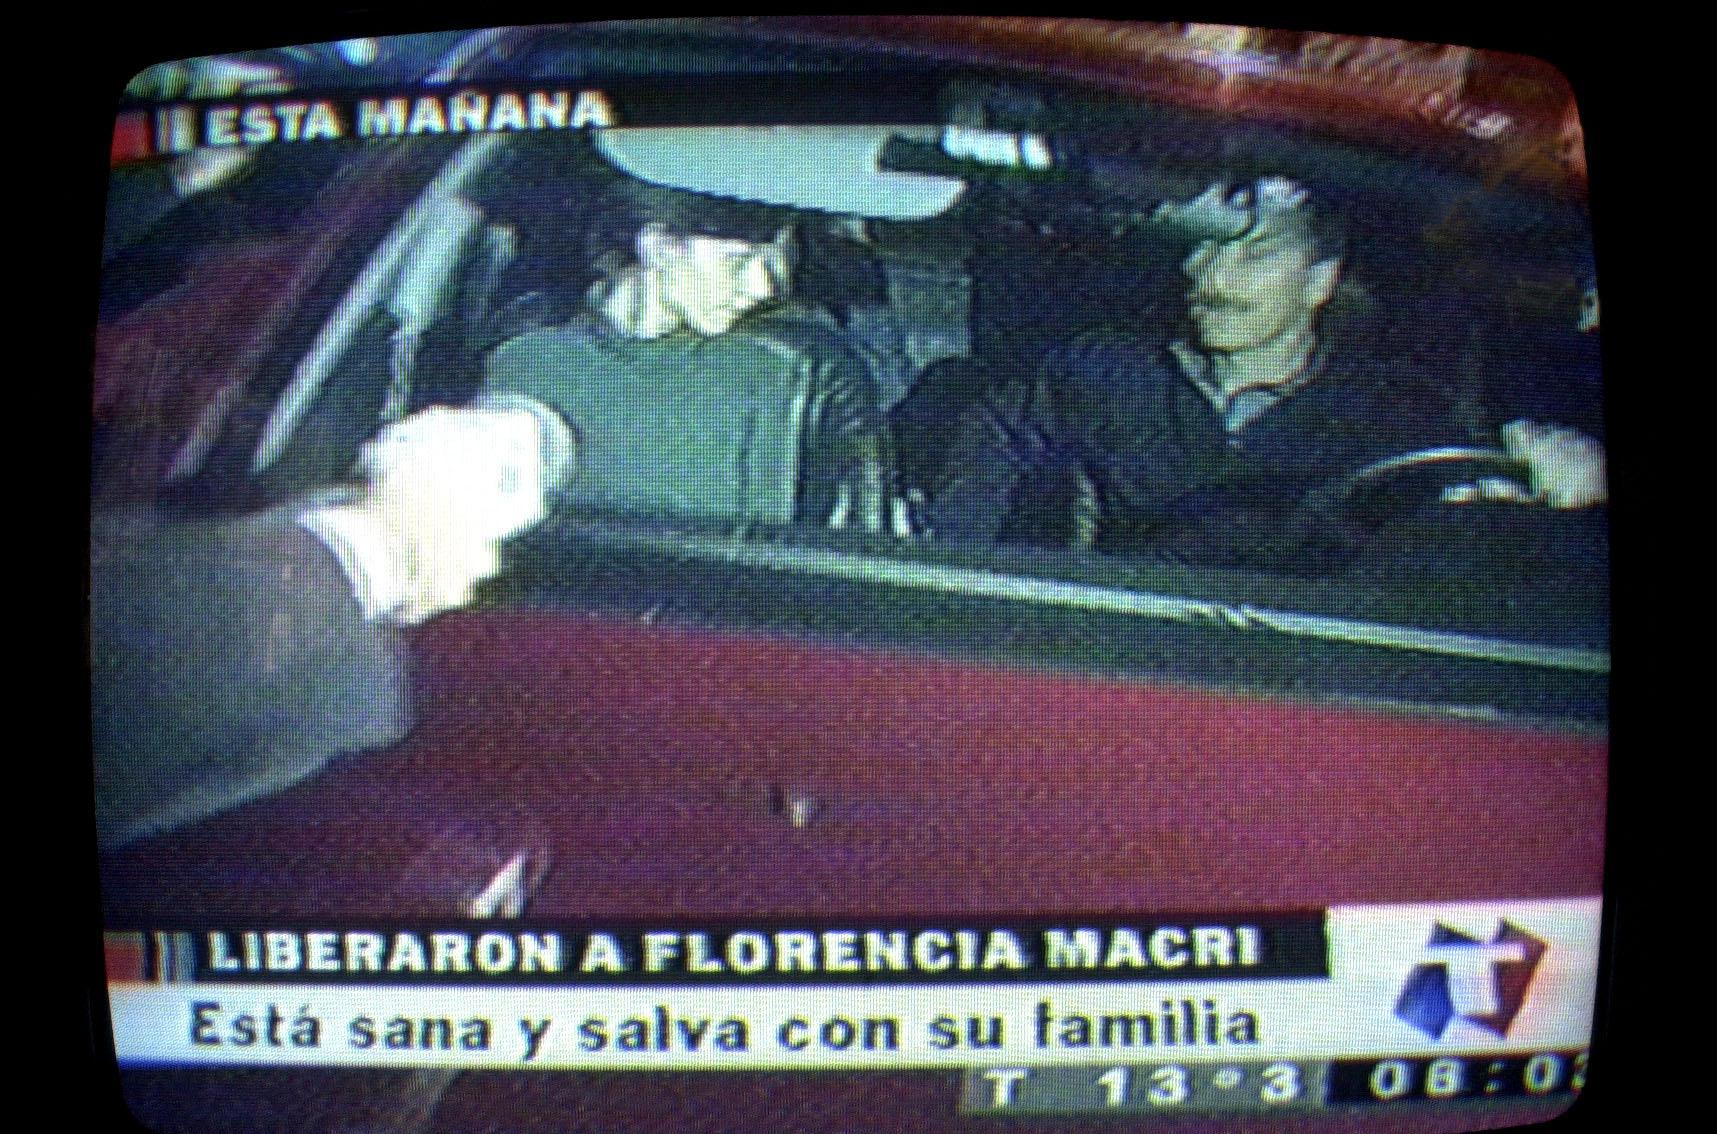 MAURICIO MACRI SE RETIRA JUNTO A SU HERMANA FLORENCIA, TRAS SER LIBERADA EN LA MADRUGADA,  05/05/03